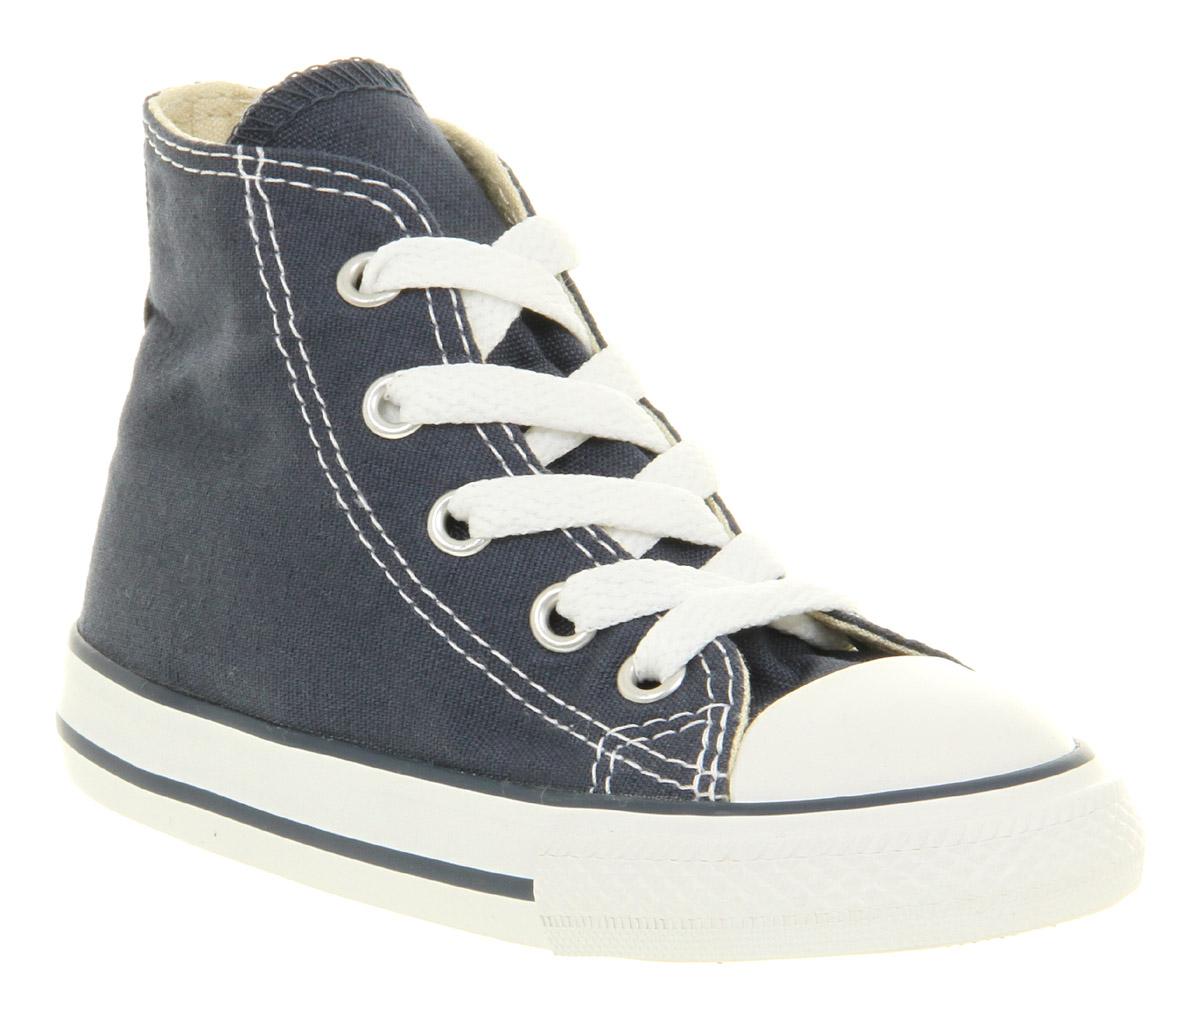 Kids-Converse-Small-Star-Hi-Canvas-Kids-12-Months-Navy-Blue-Canvas-Kids